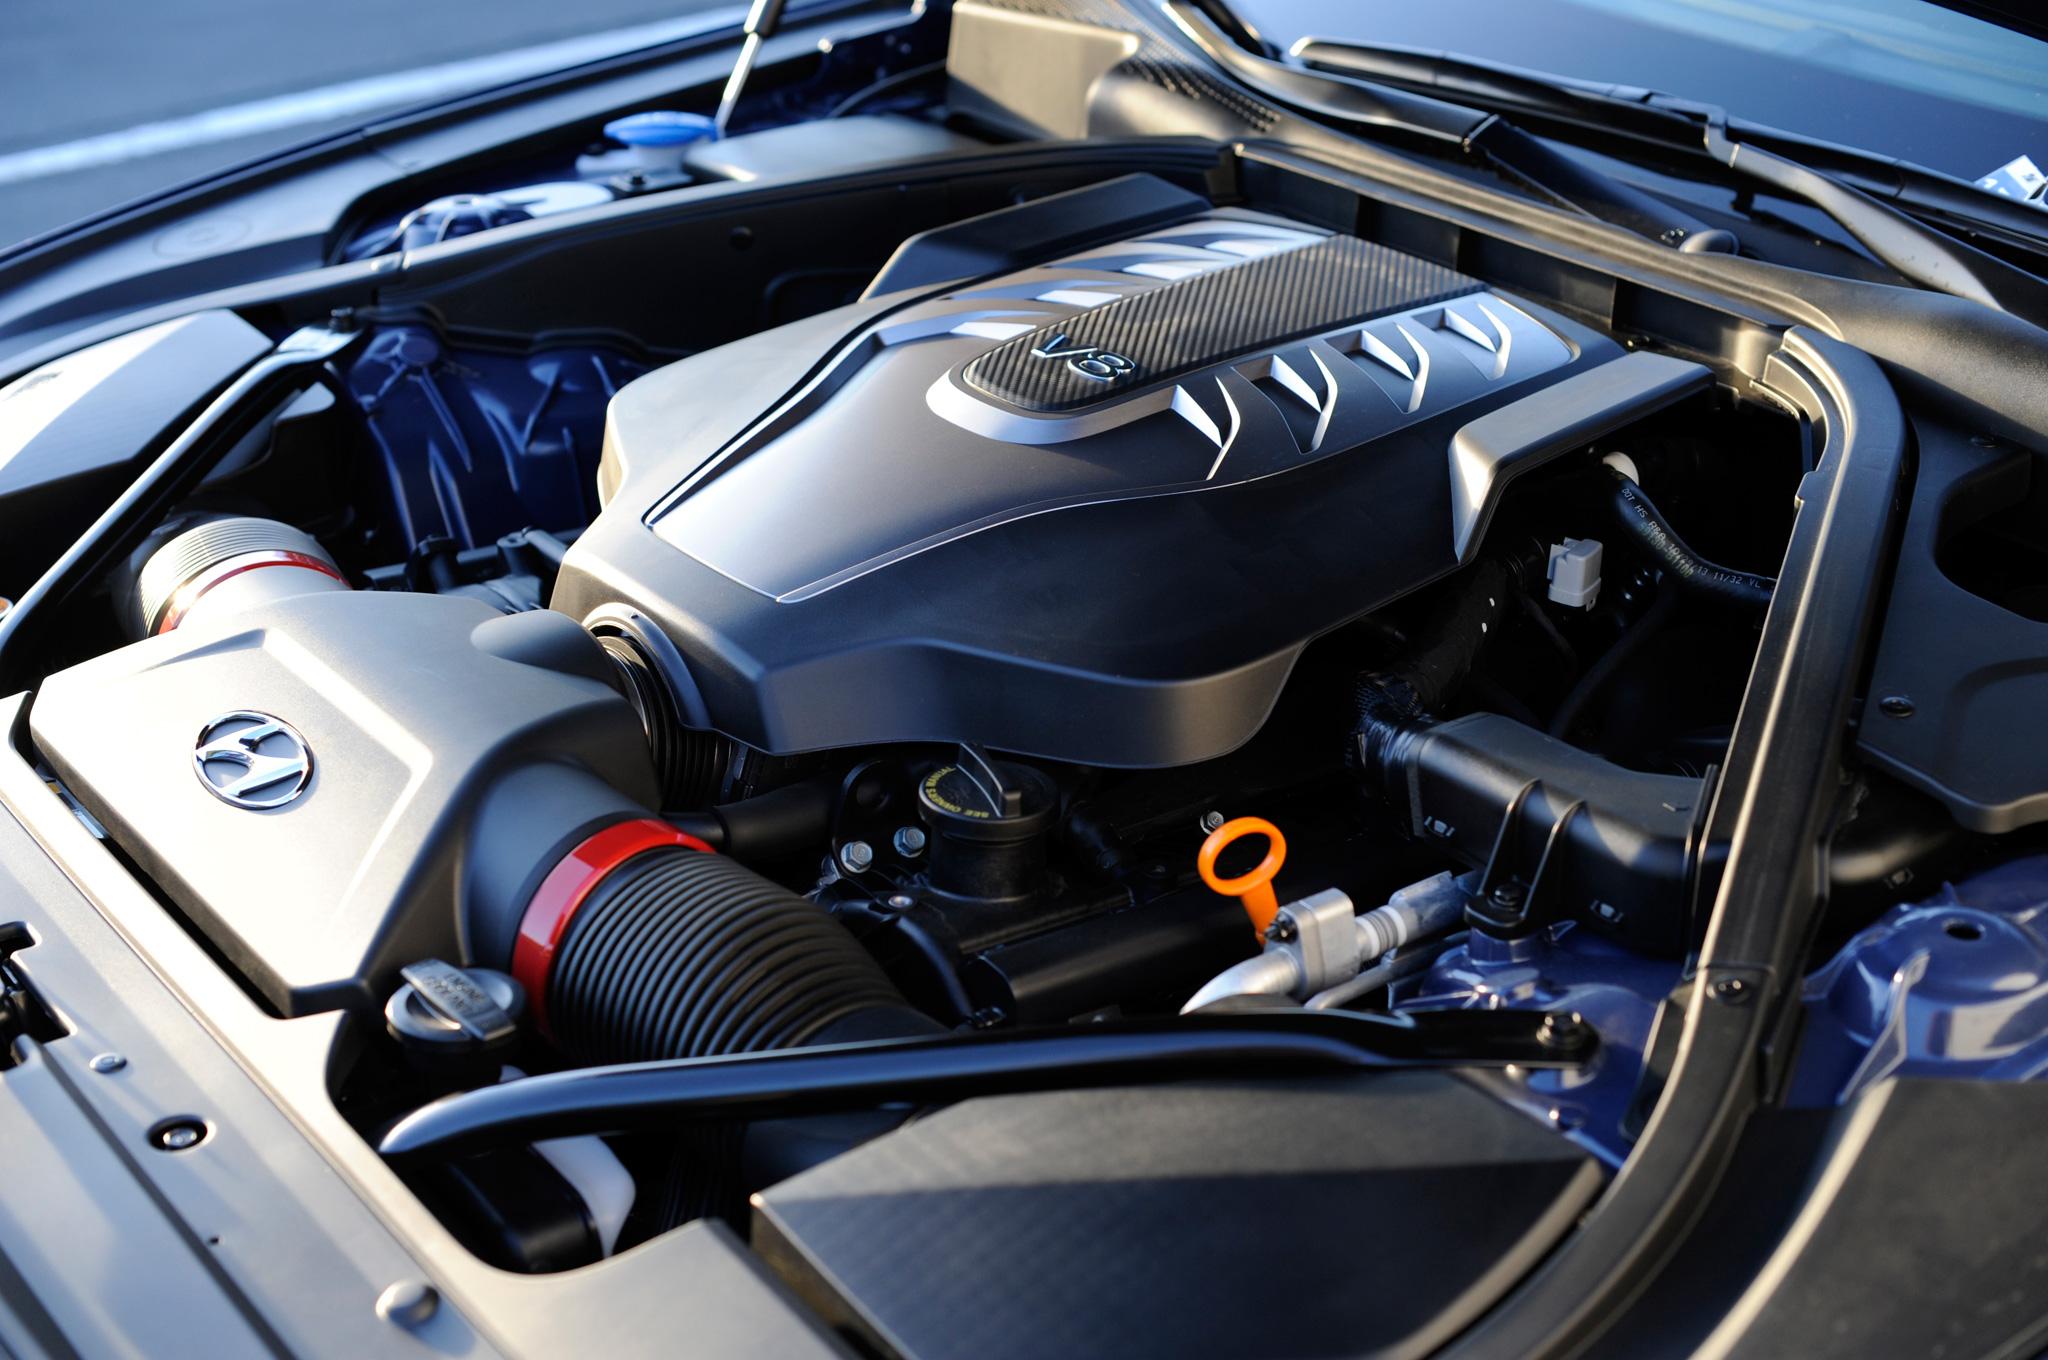 2015 Hyundai Genesis V8 Engine View